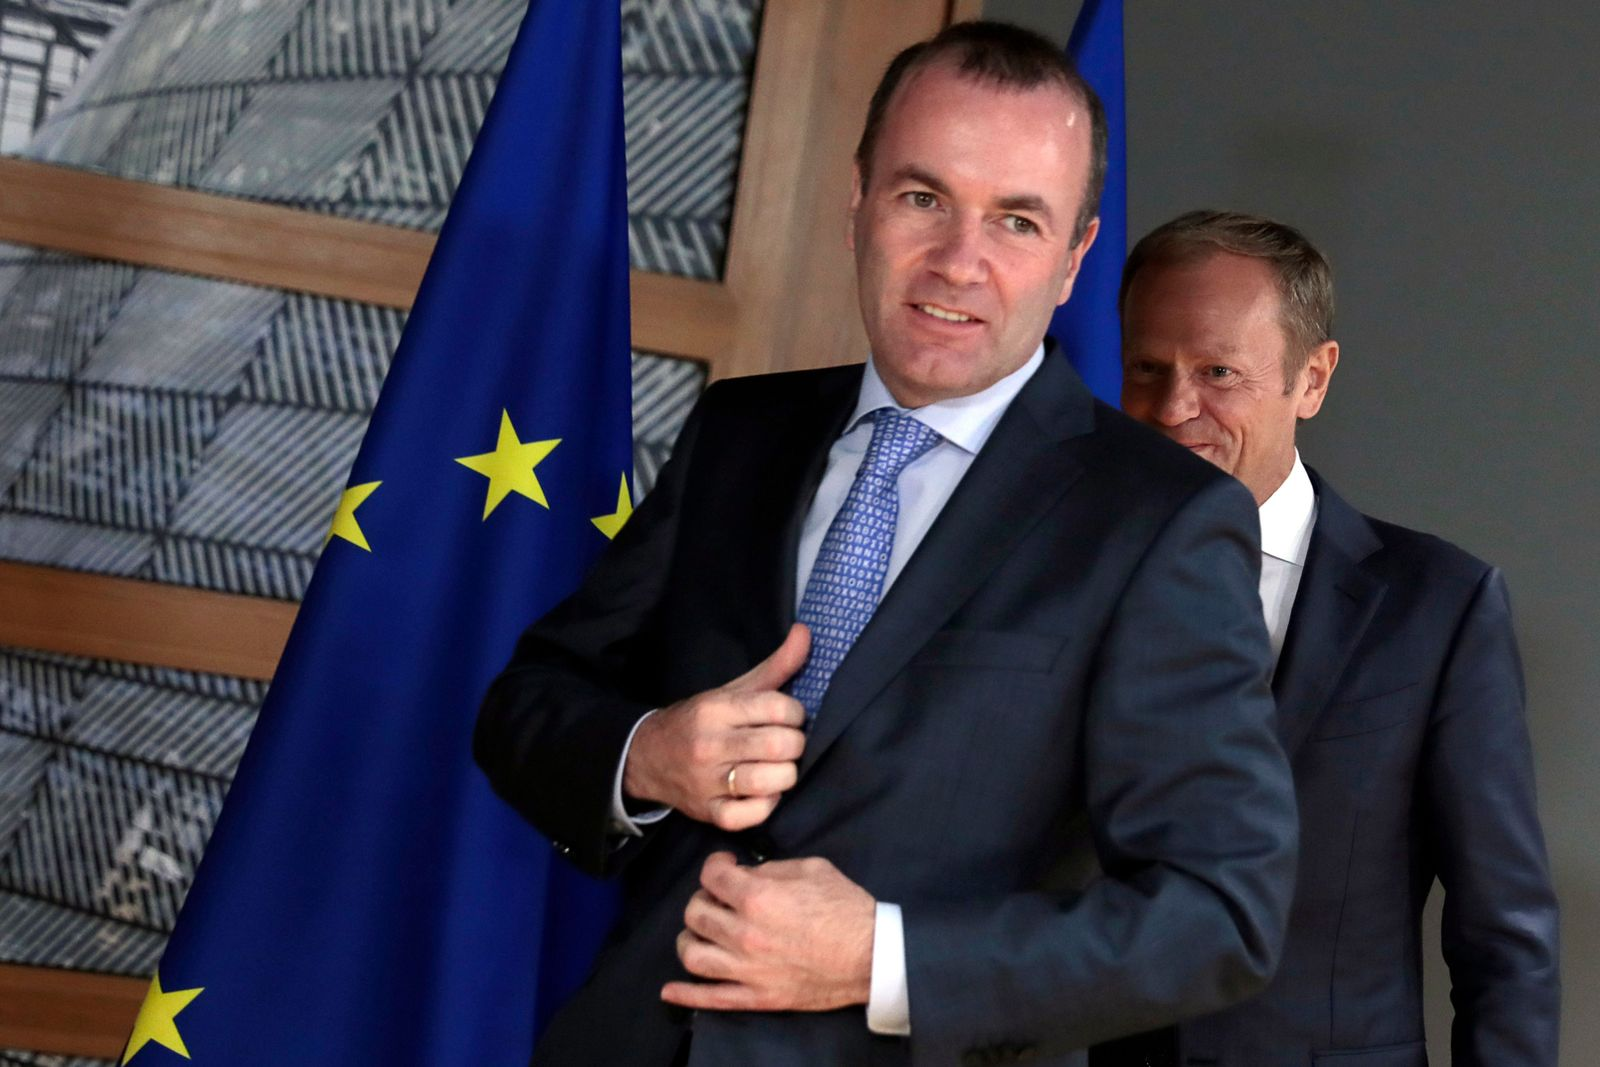 Manfred Weber und Donald Tusk BELGIUM-EU-POLITICS